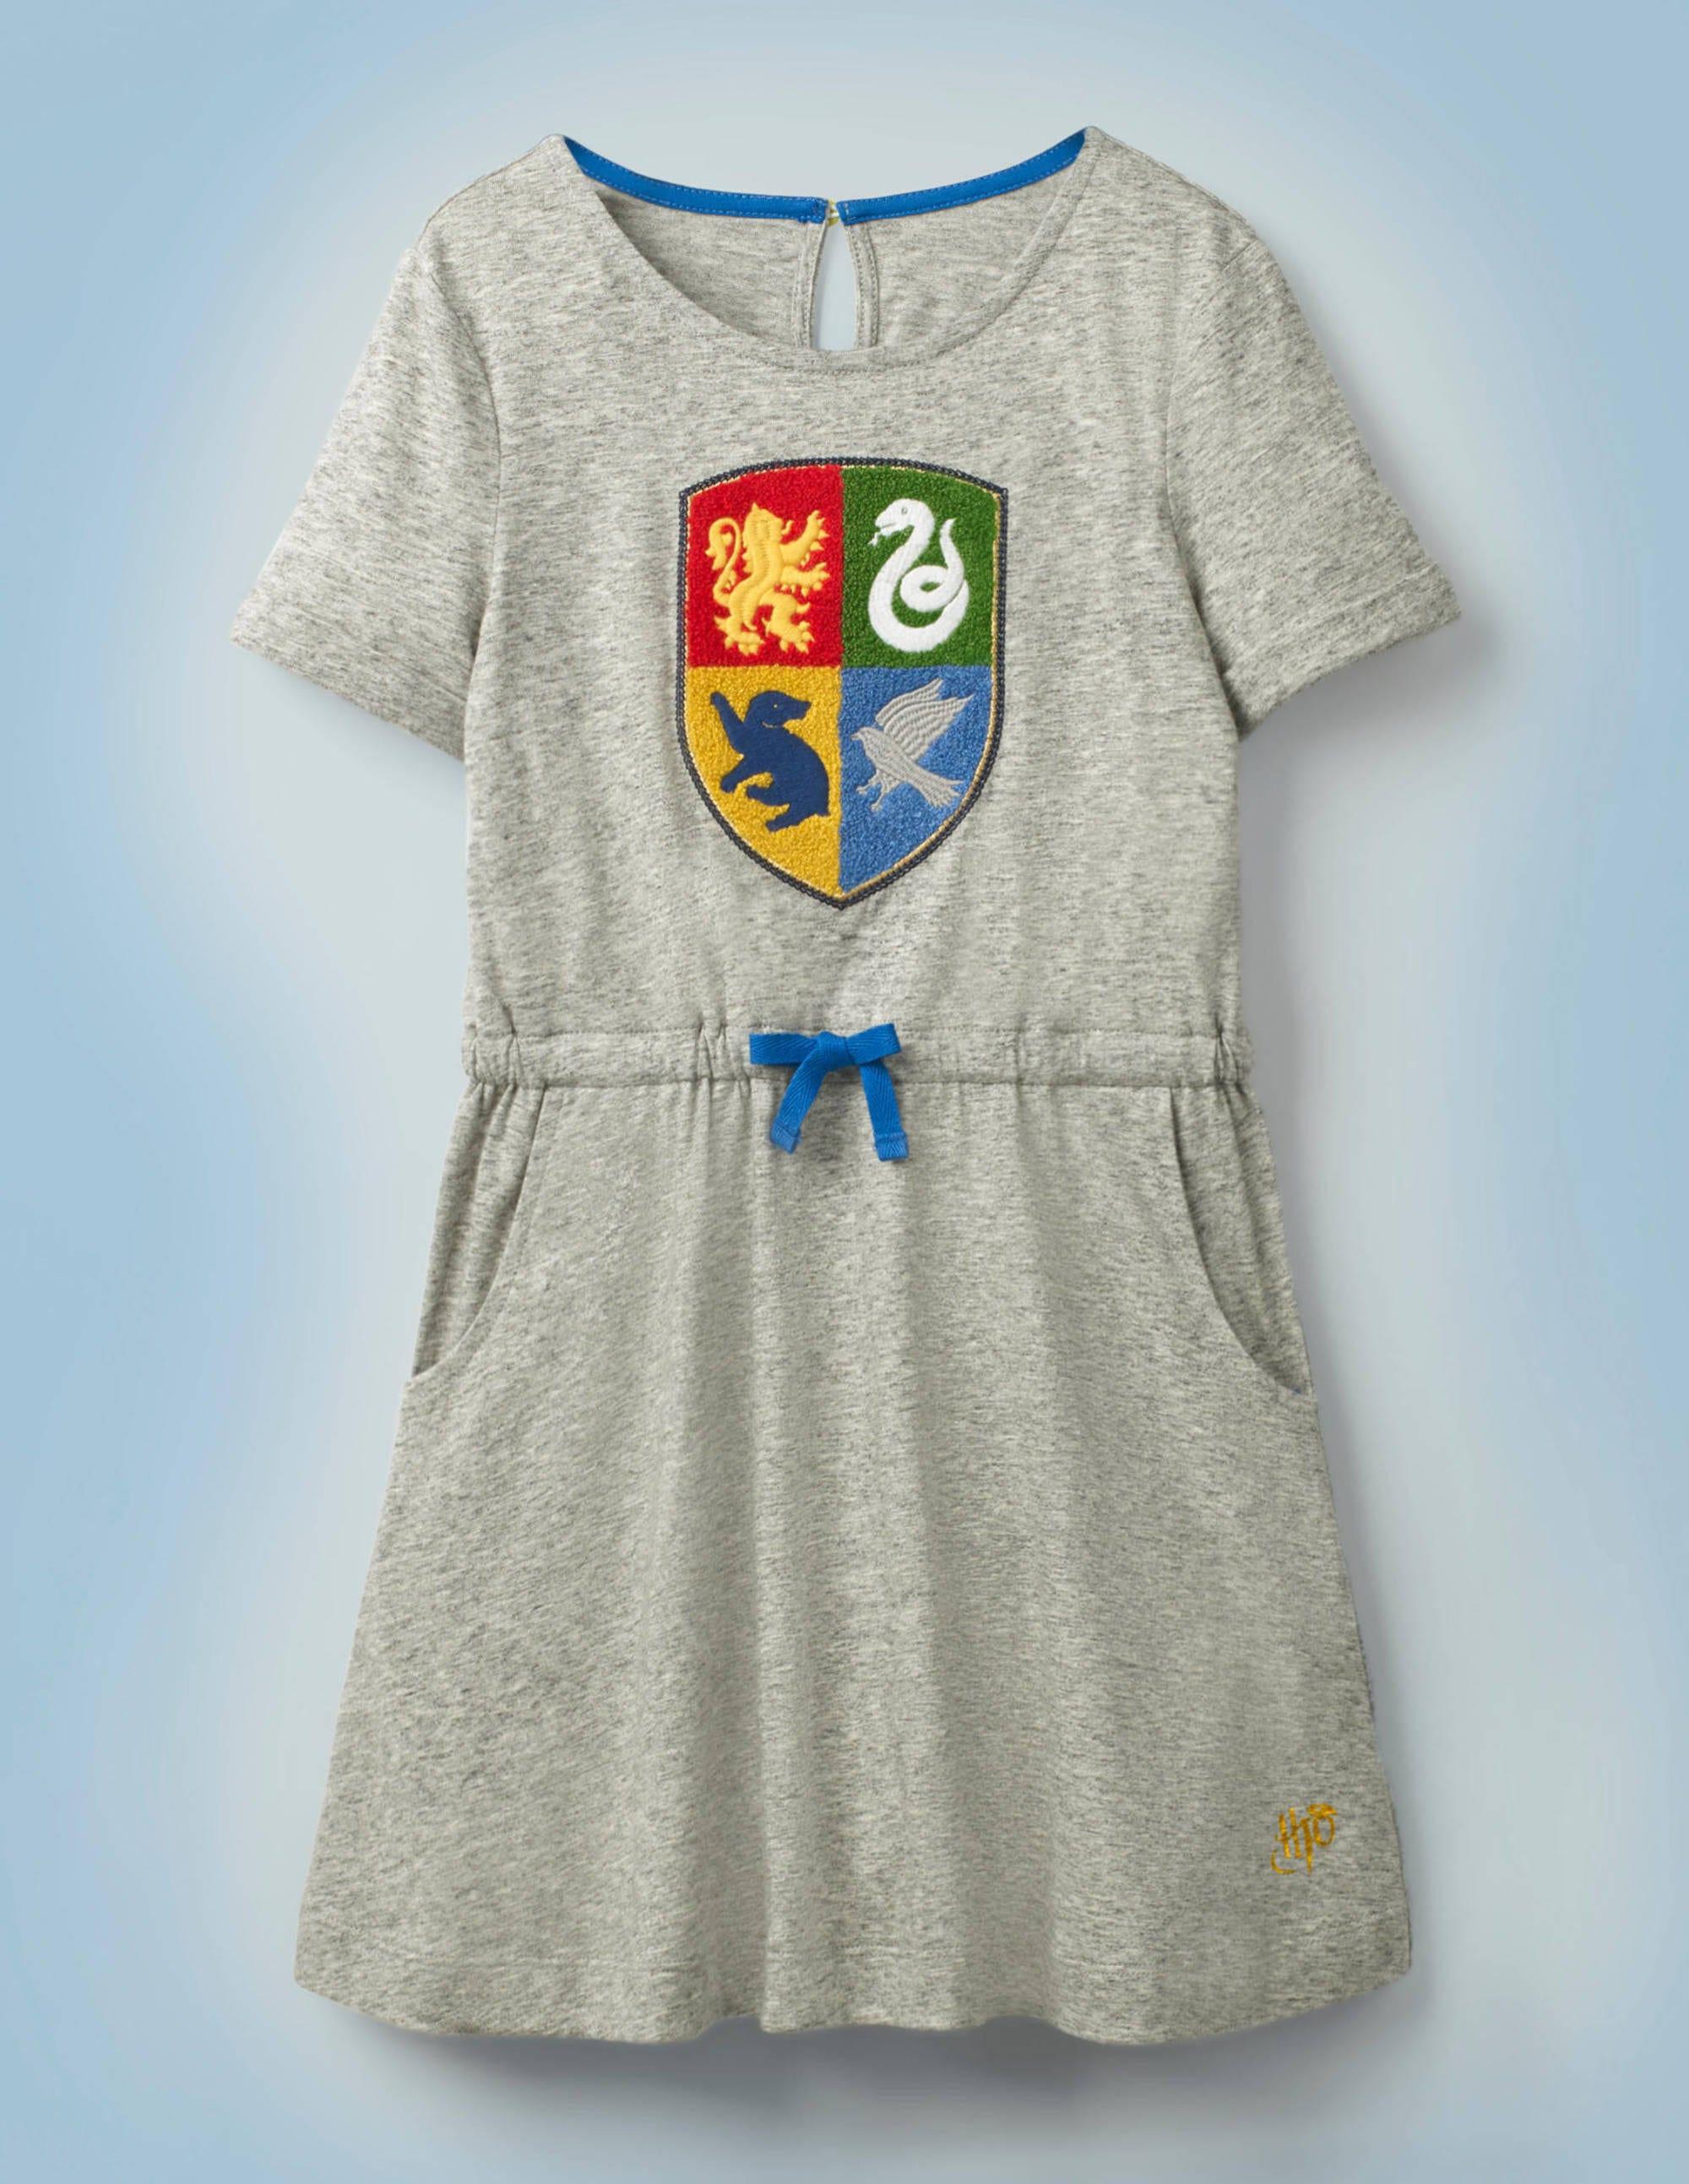 Boden Hogwarts Crest Dress - Mid Grey Jaspe Marl